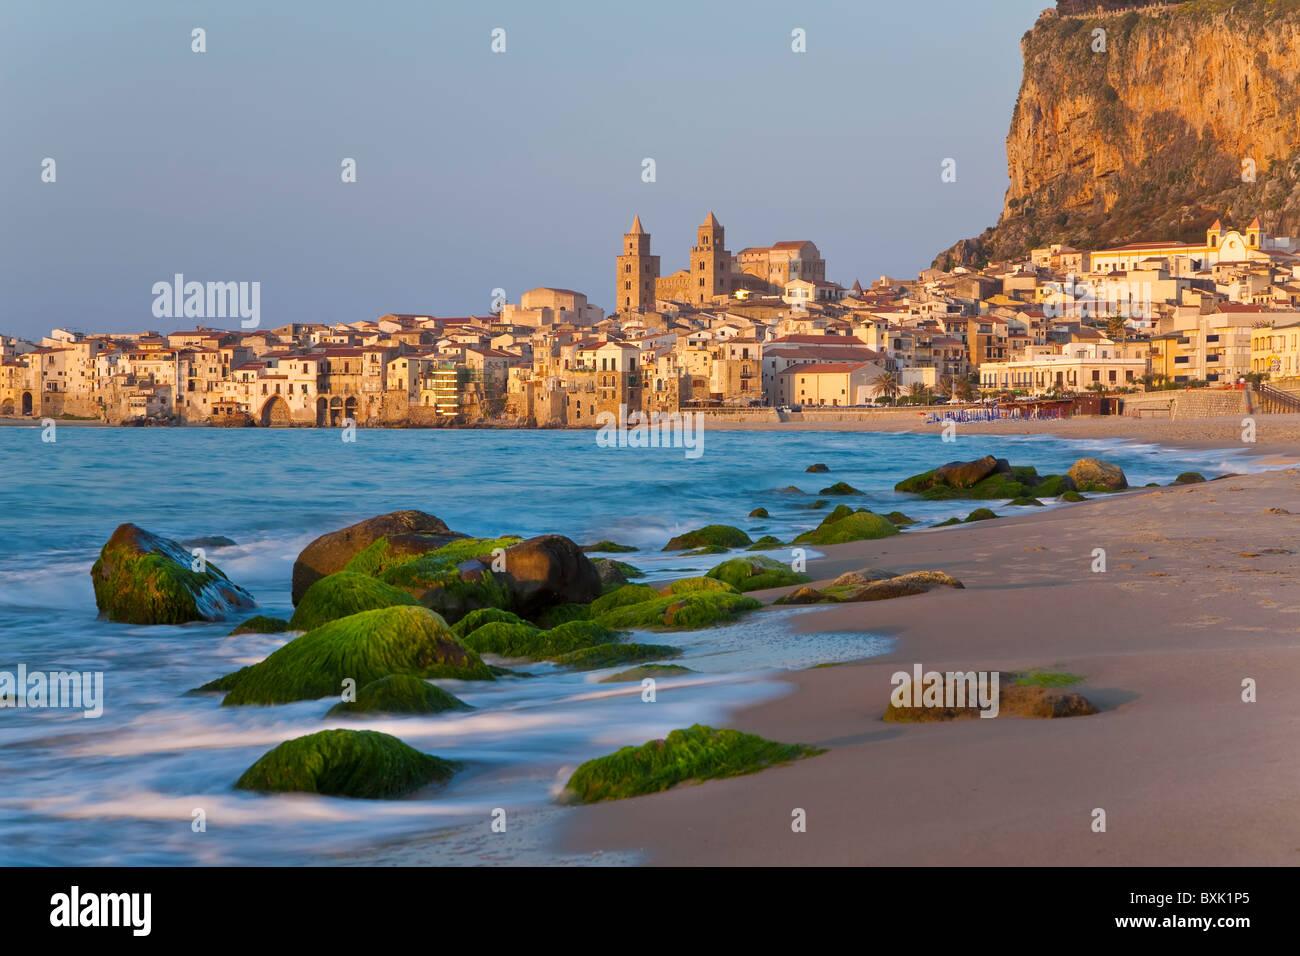 Beach at sunset, Cefalu, N coast, Sicily - Stock Image